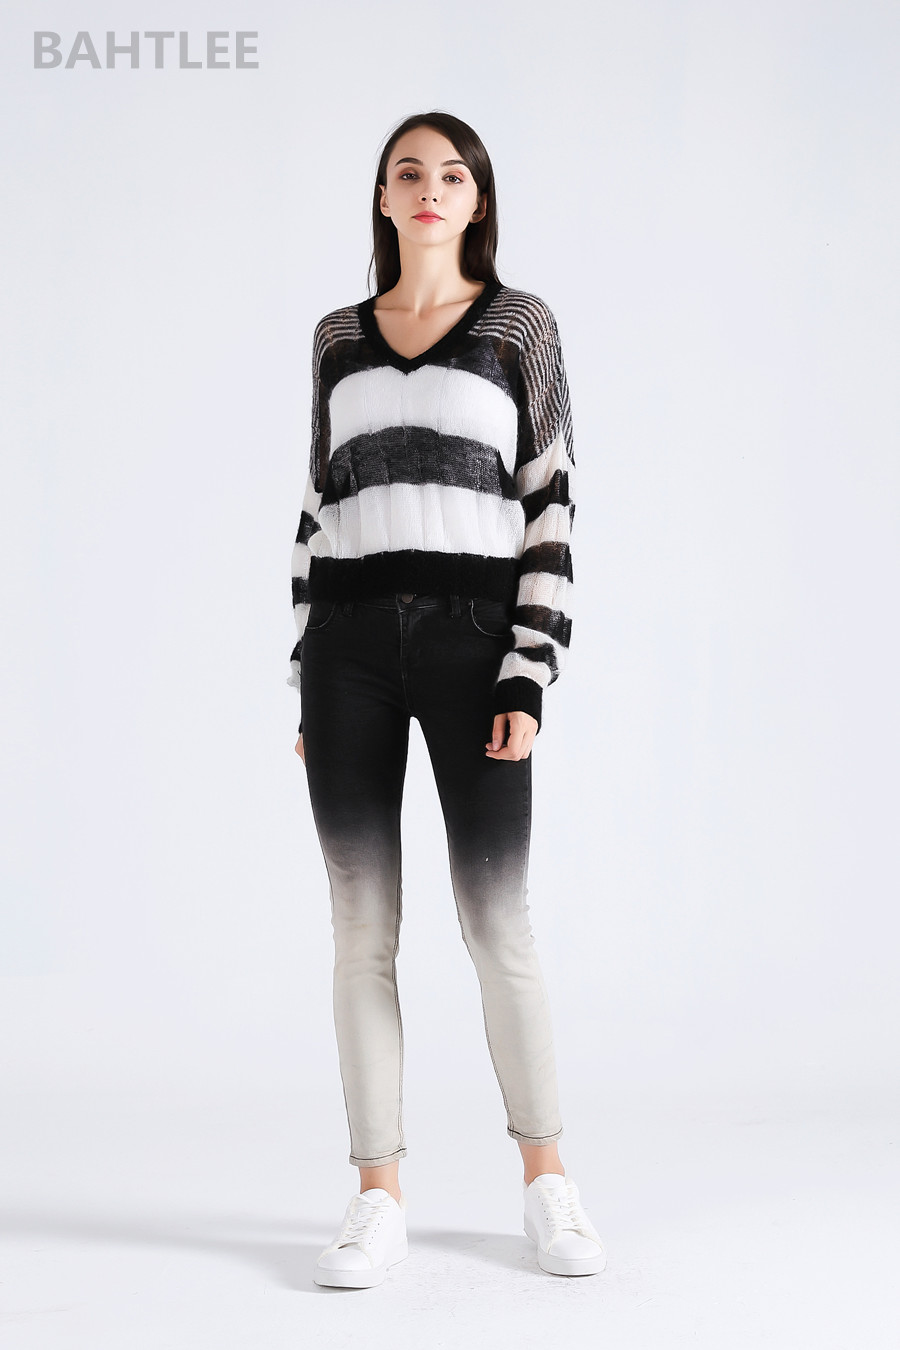 BAHTLEE 2018 Otoño Invierno mujeres Top de Mohair suéteres suéter ...